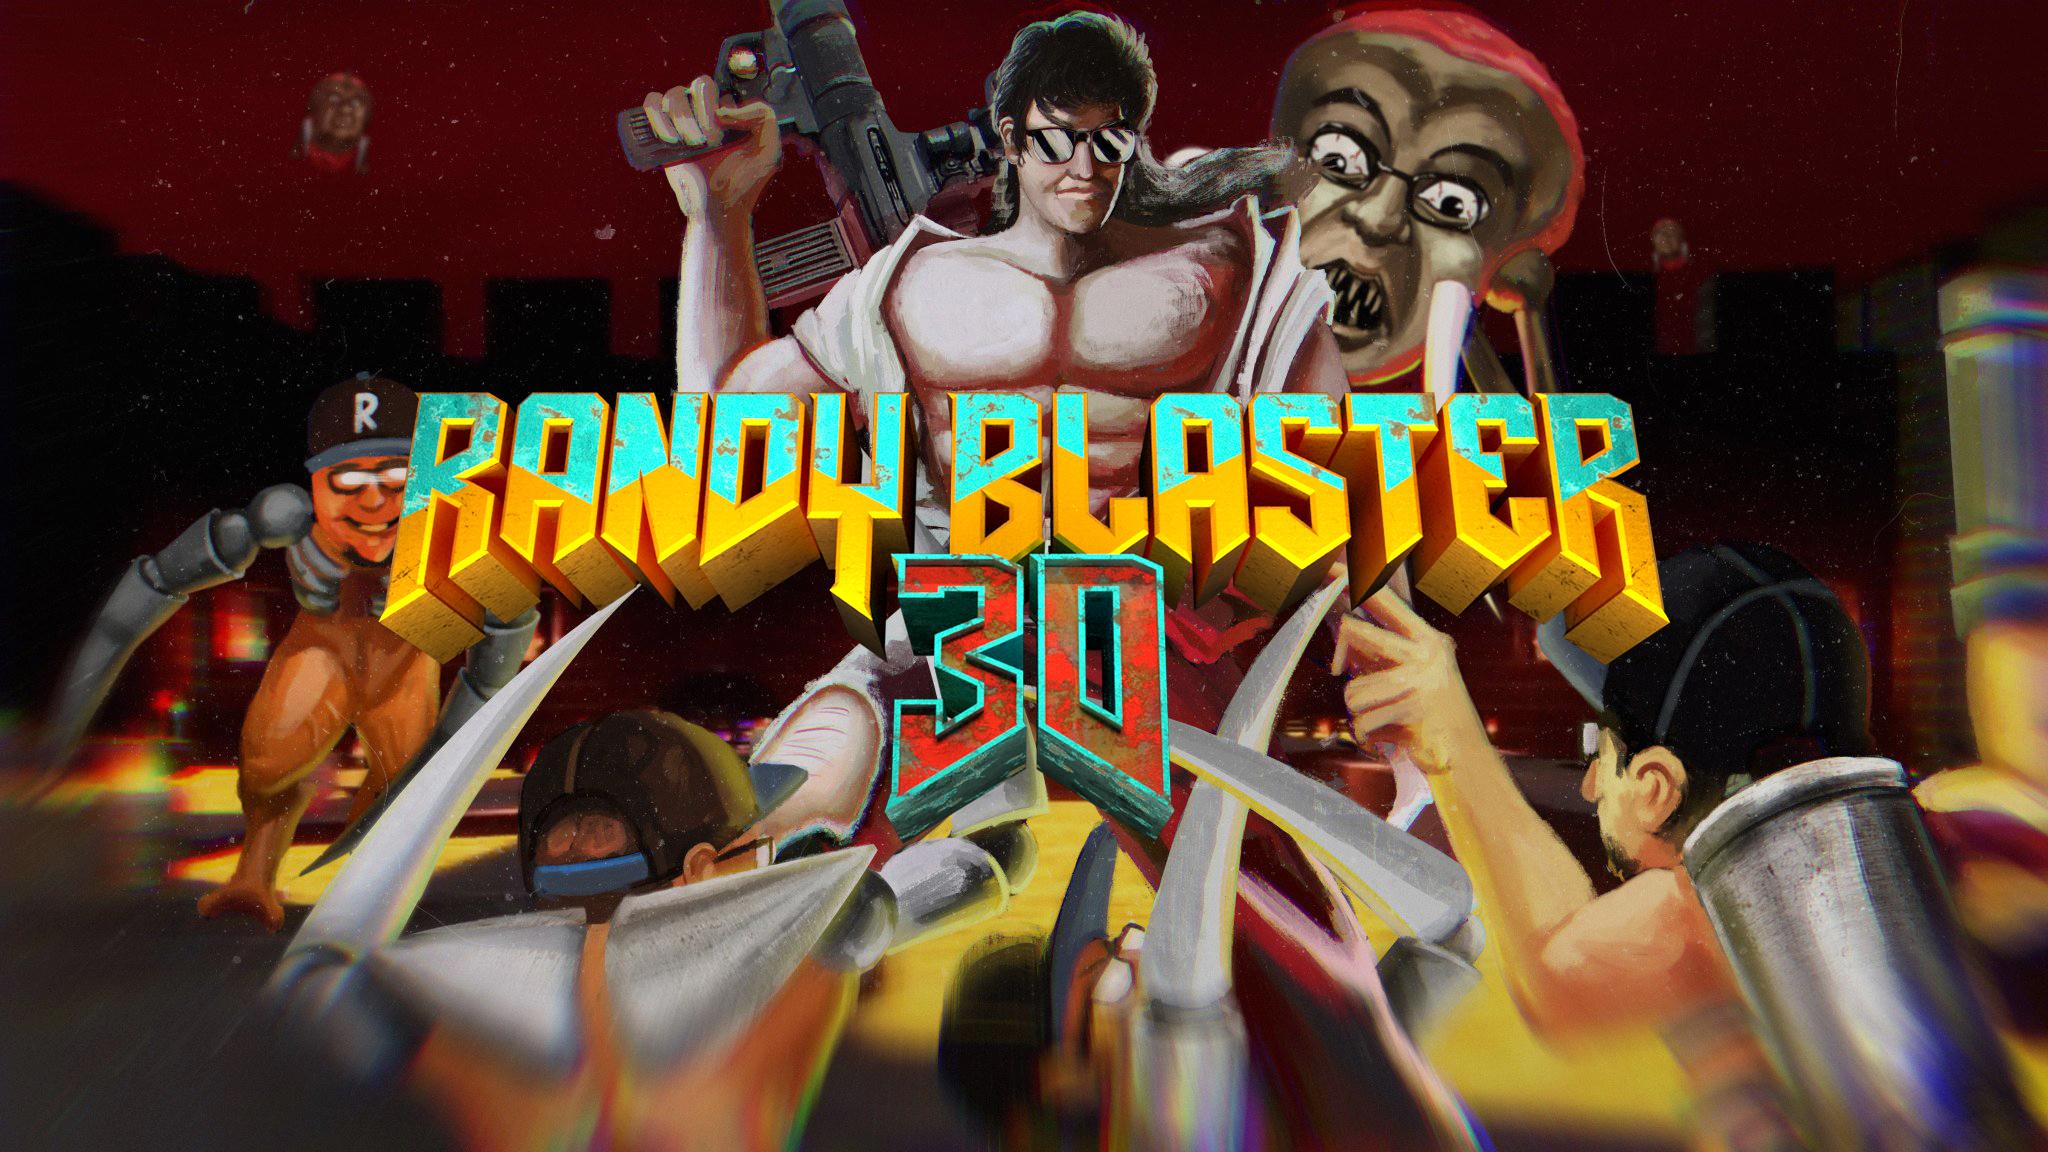 Randy Blaster 3D [BOOTLEG EDITION]